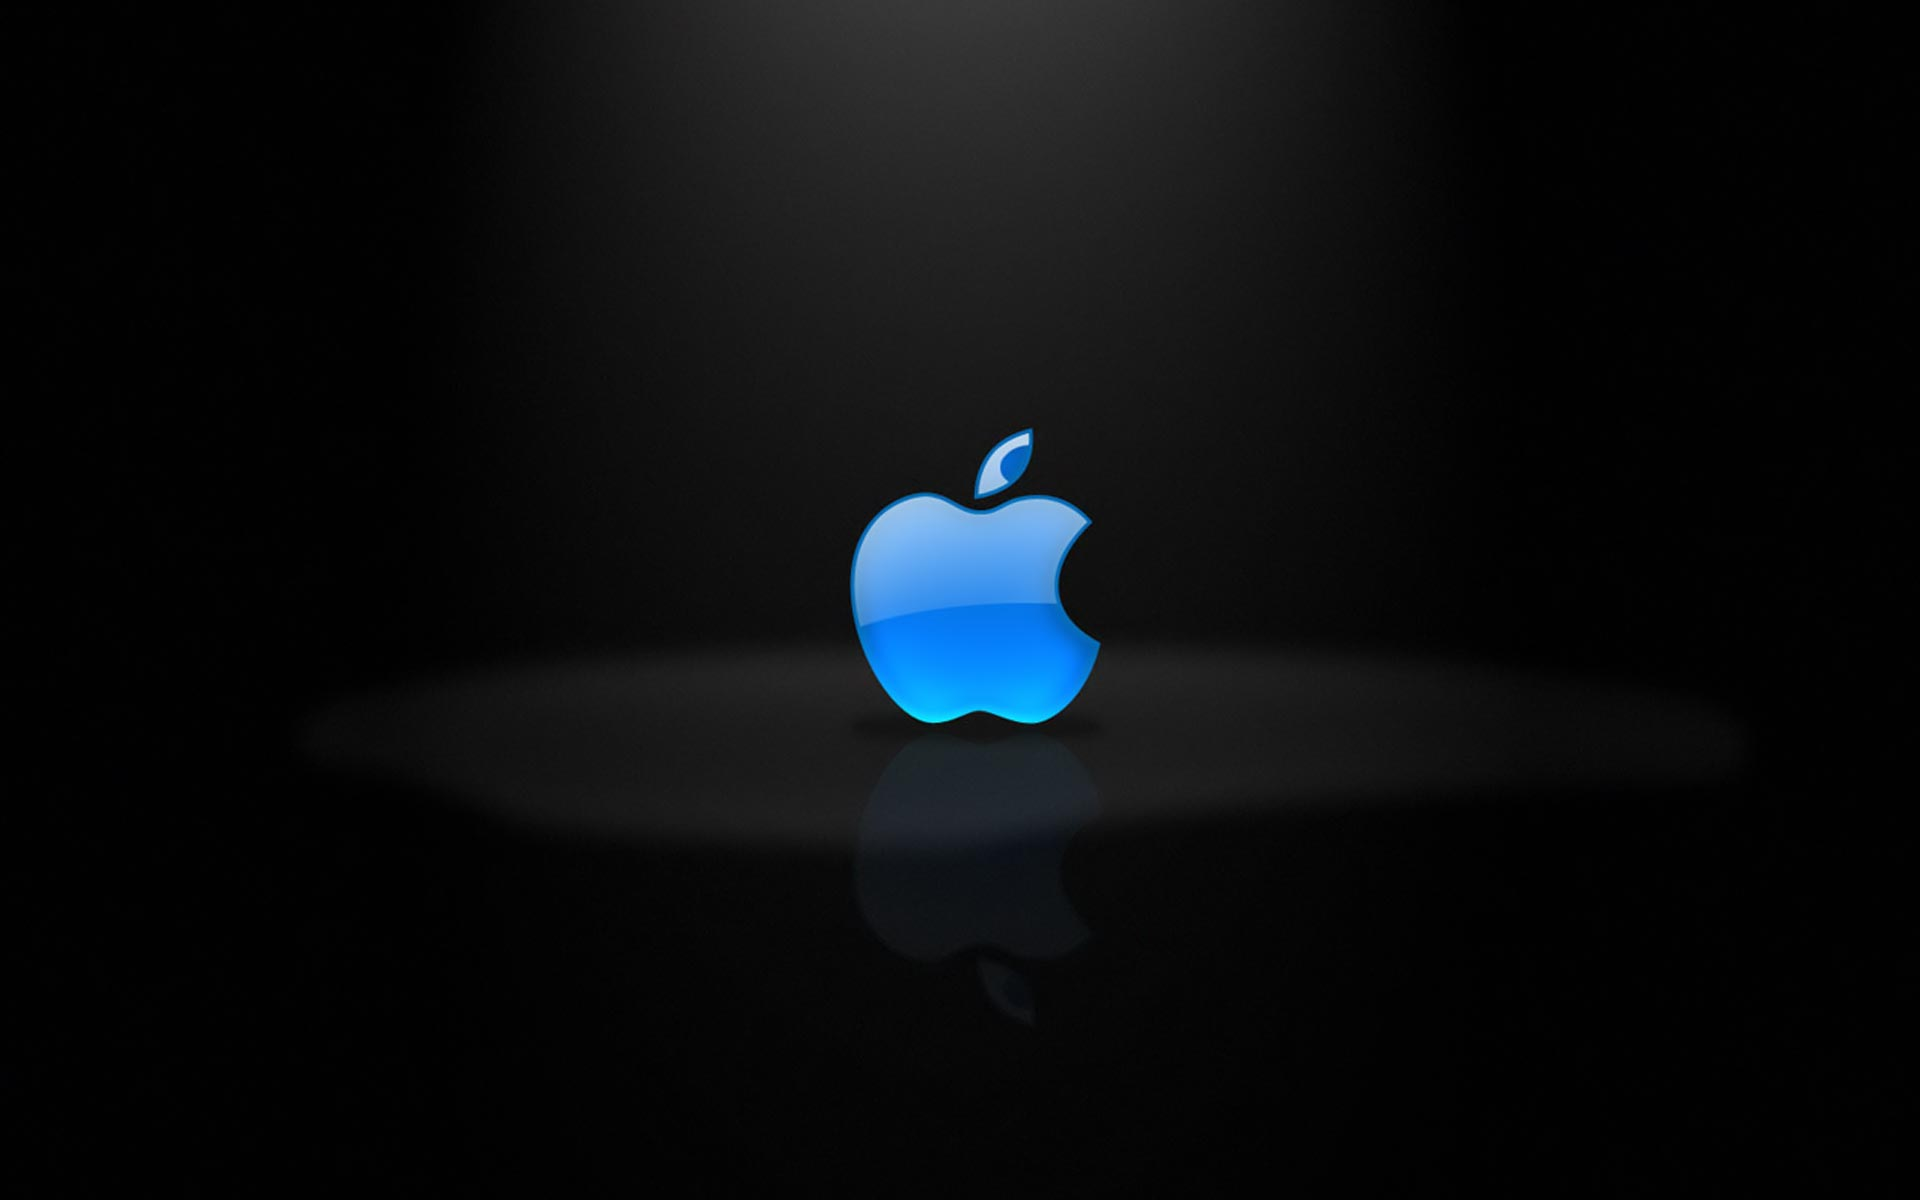 Mac Desktop Backgrounds Desktop Backgrounds 1920x1200